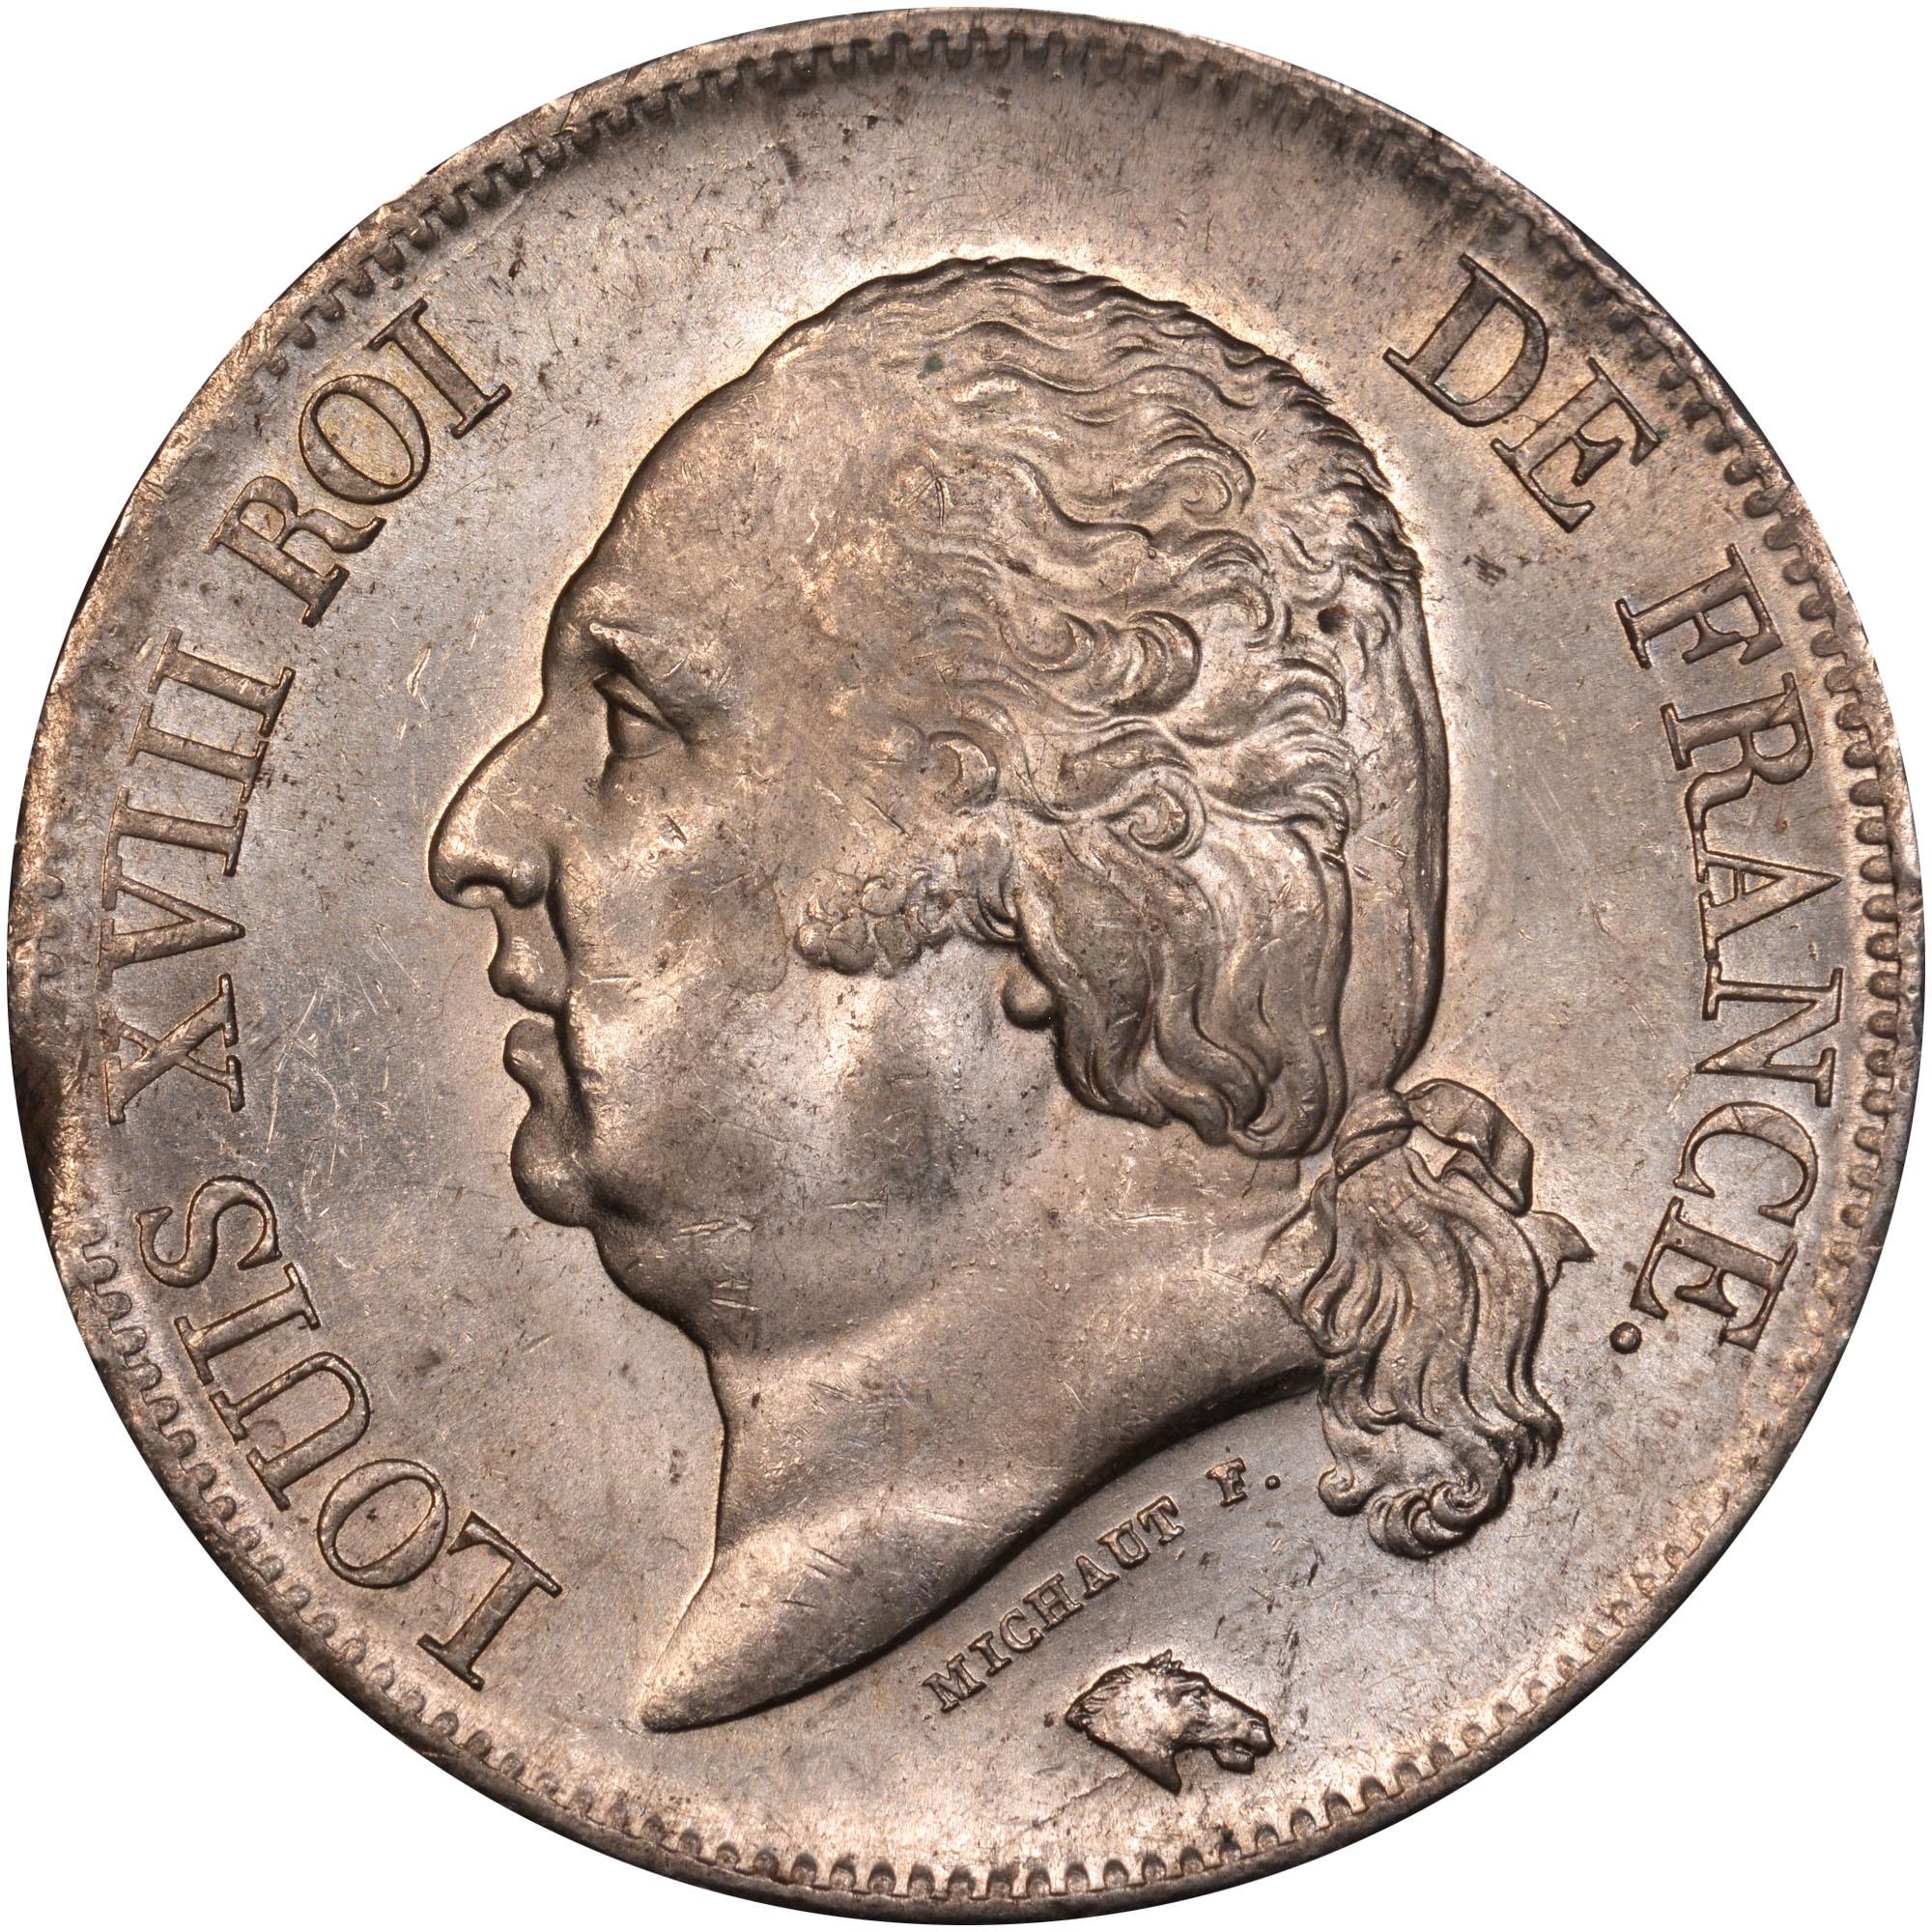 France 5 francs km prices values ngc for France francs